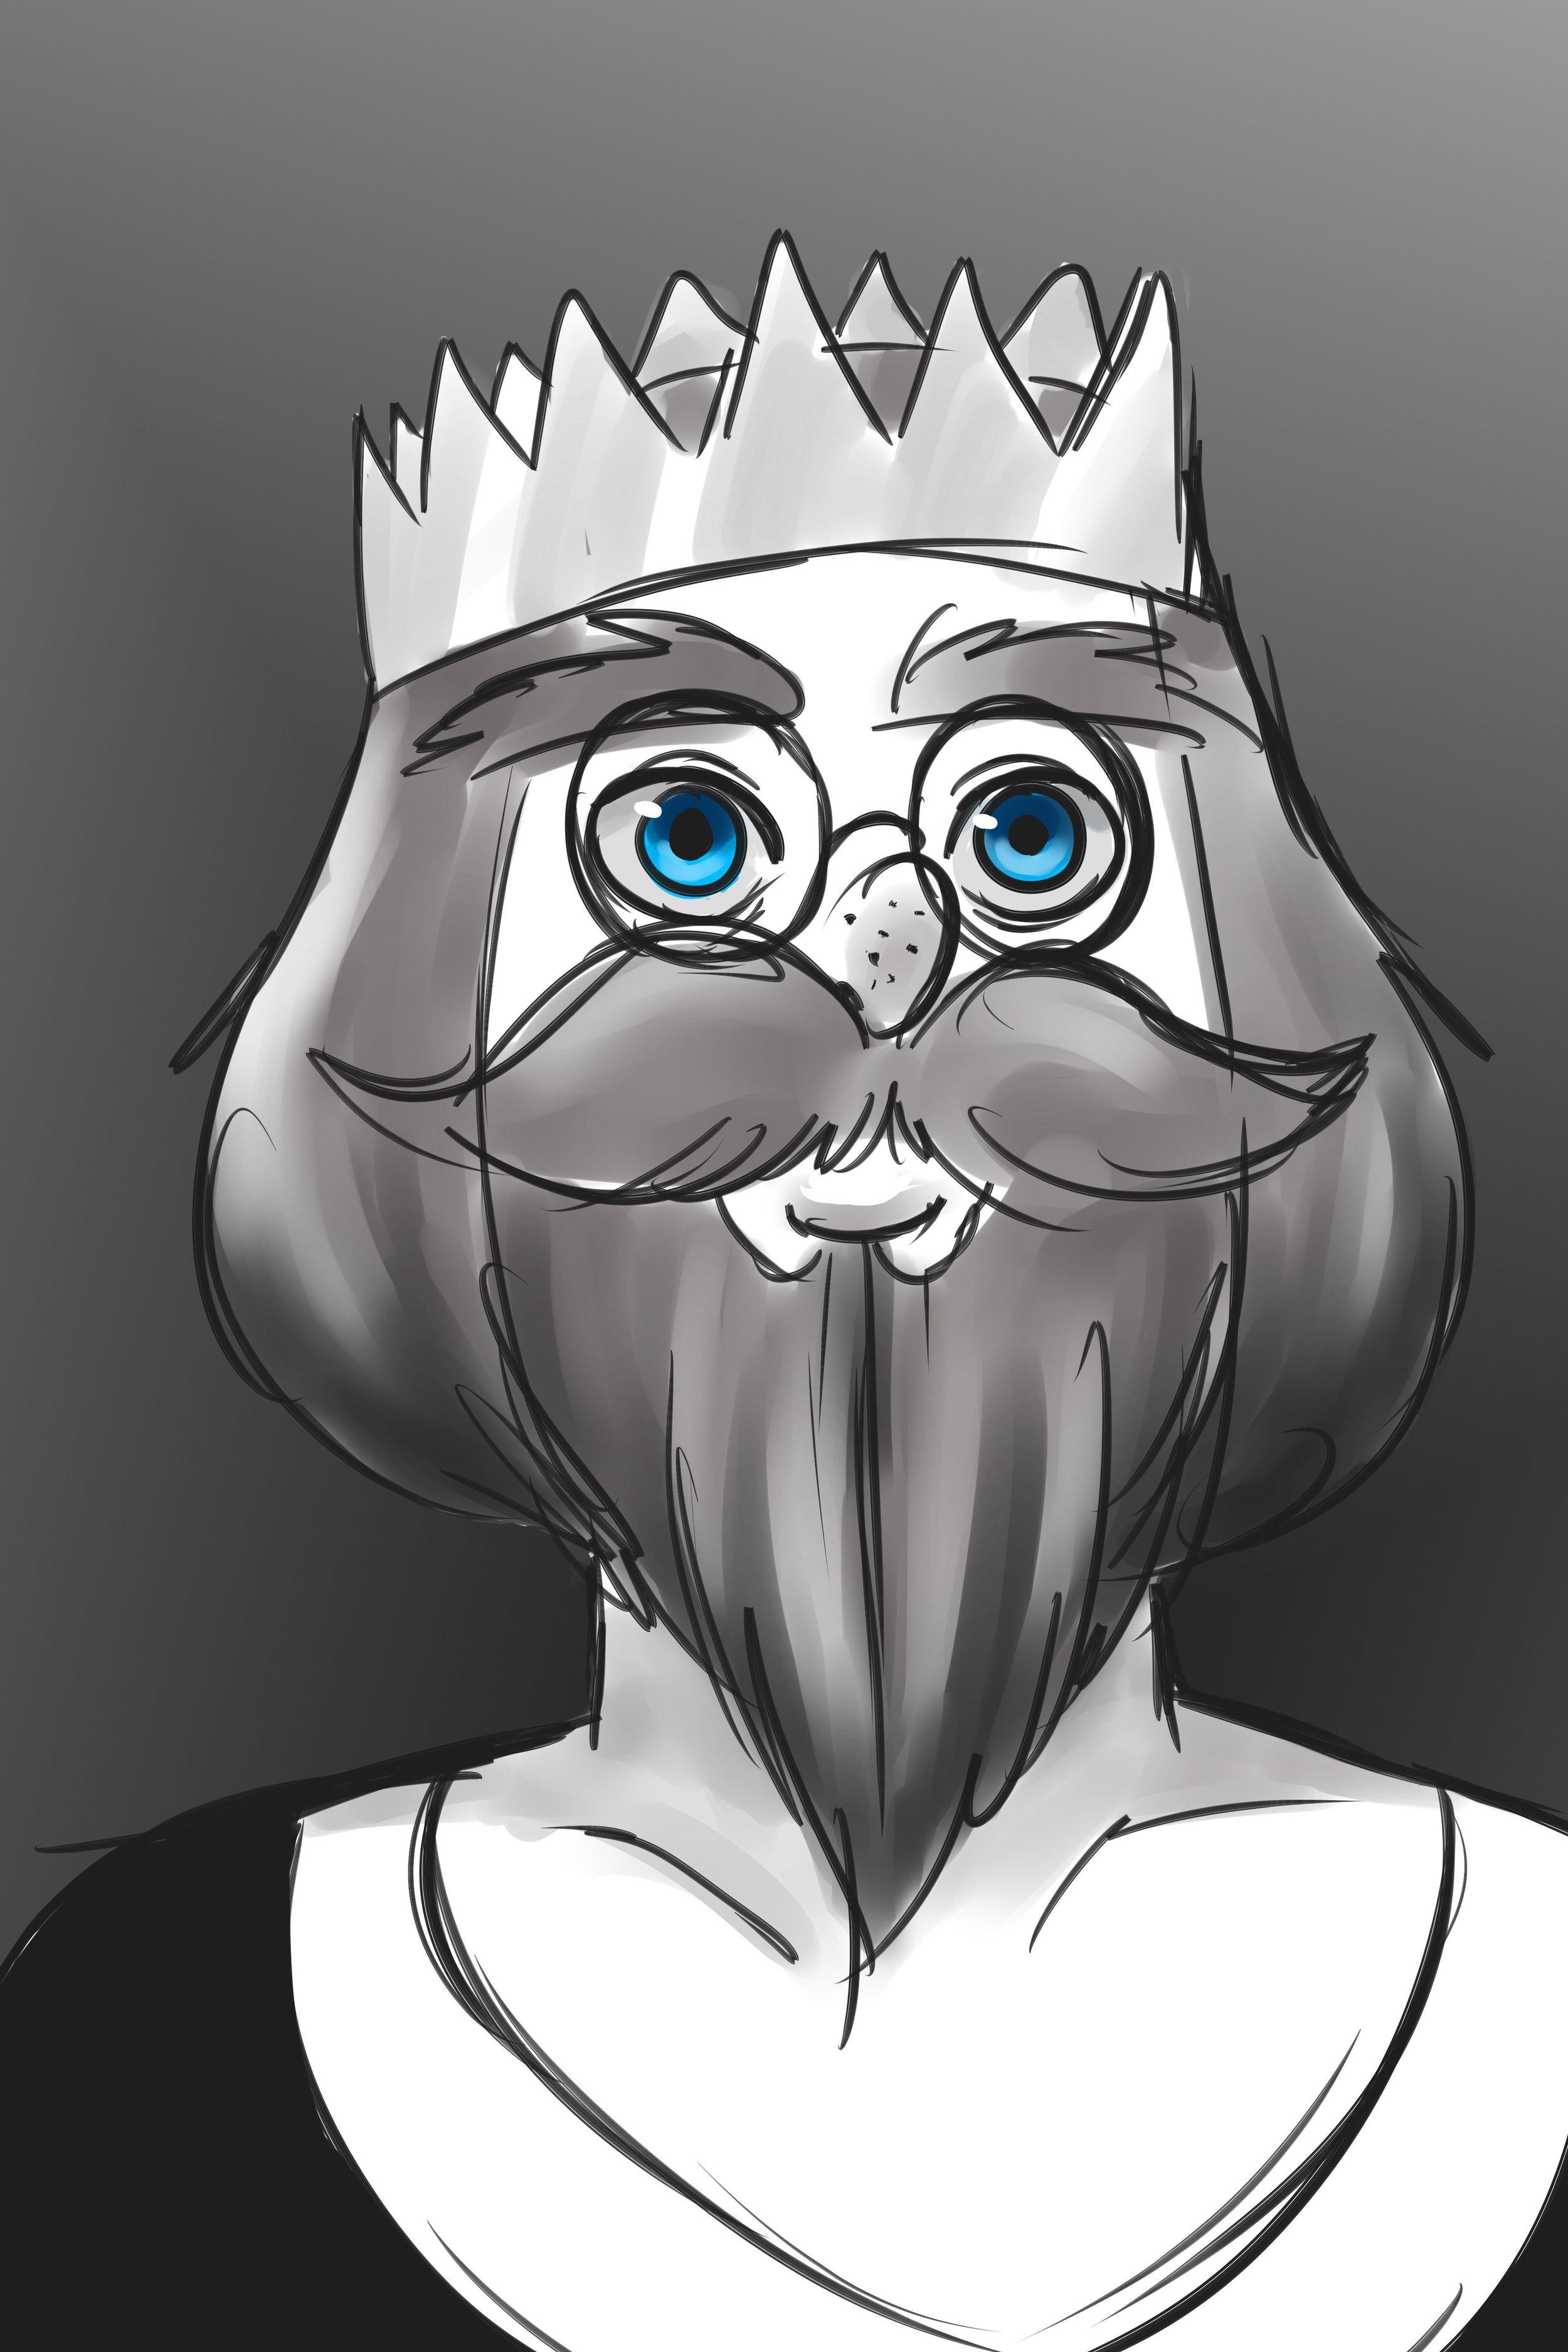 King-03.jpg